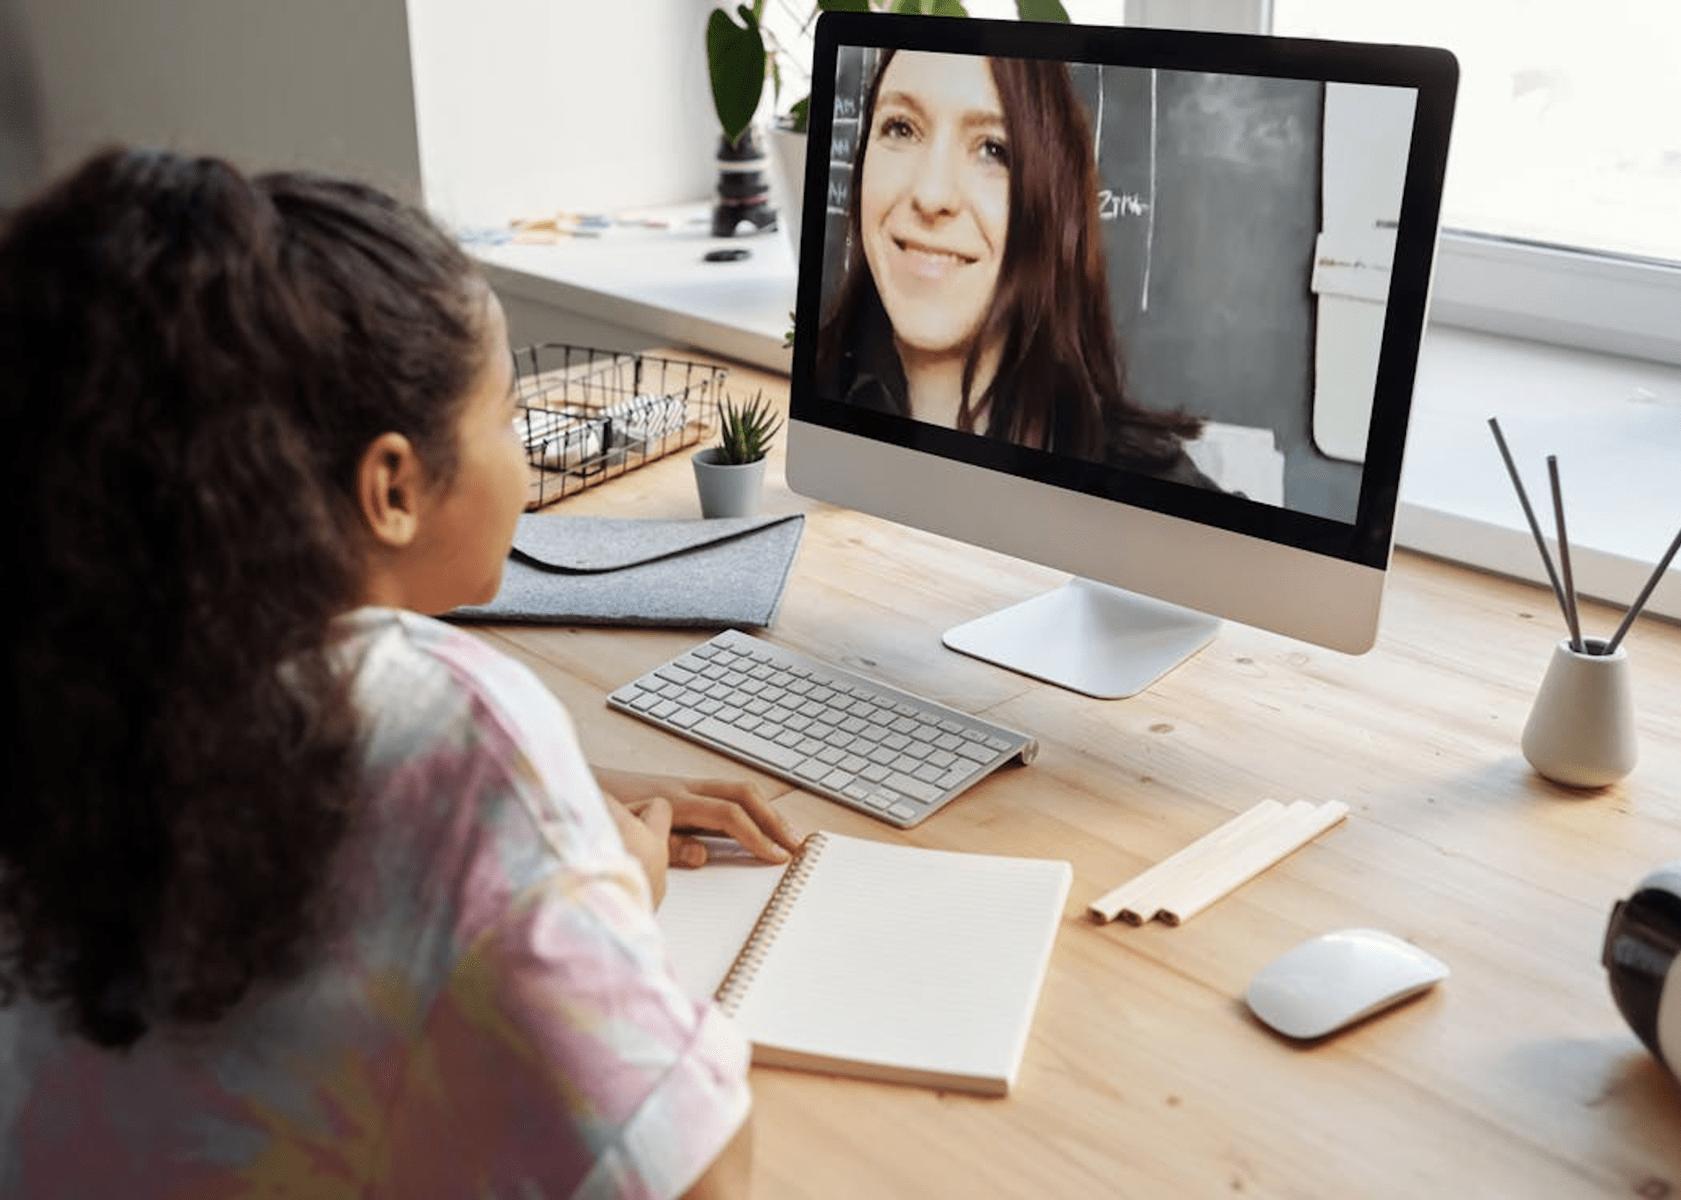 Digitalization in Schools: Five Tips for Implementation